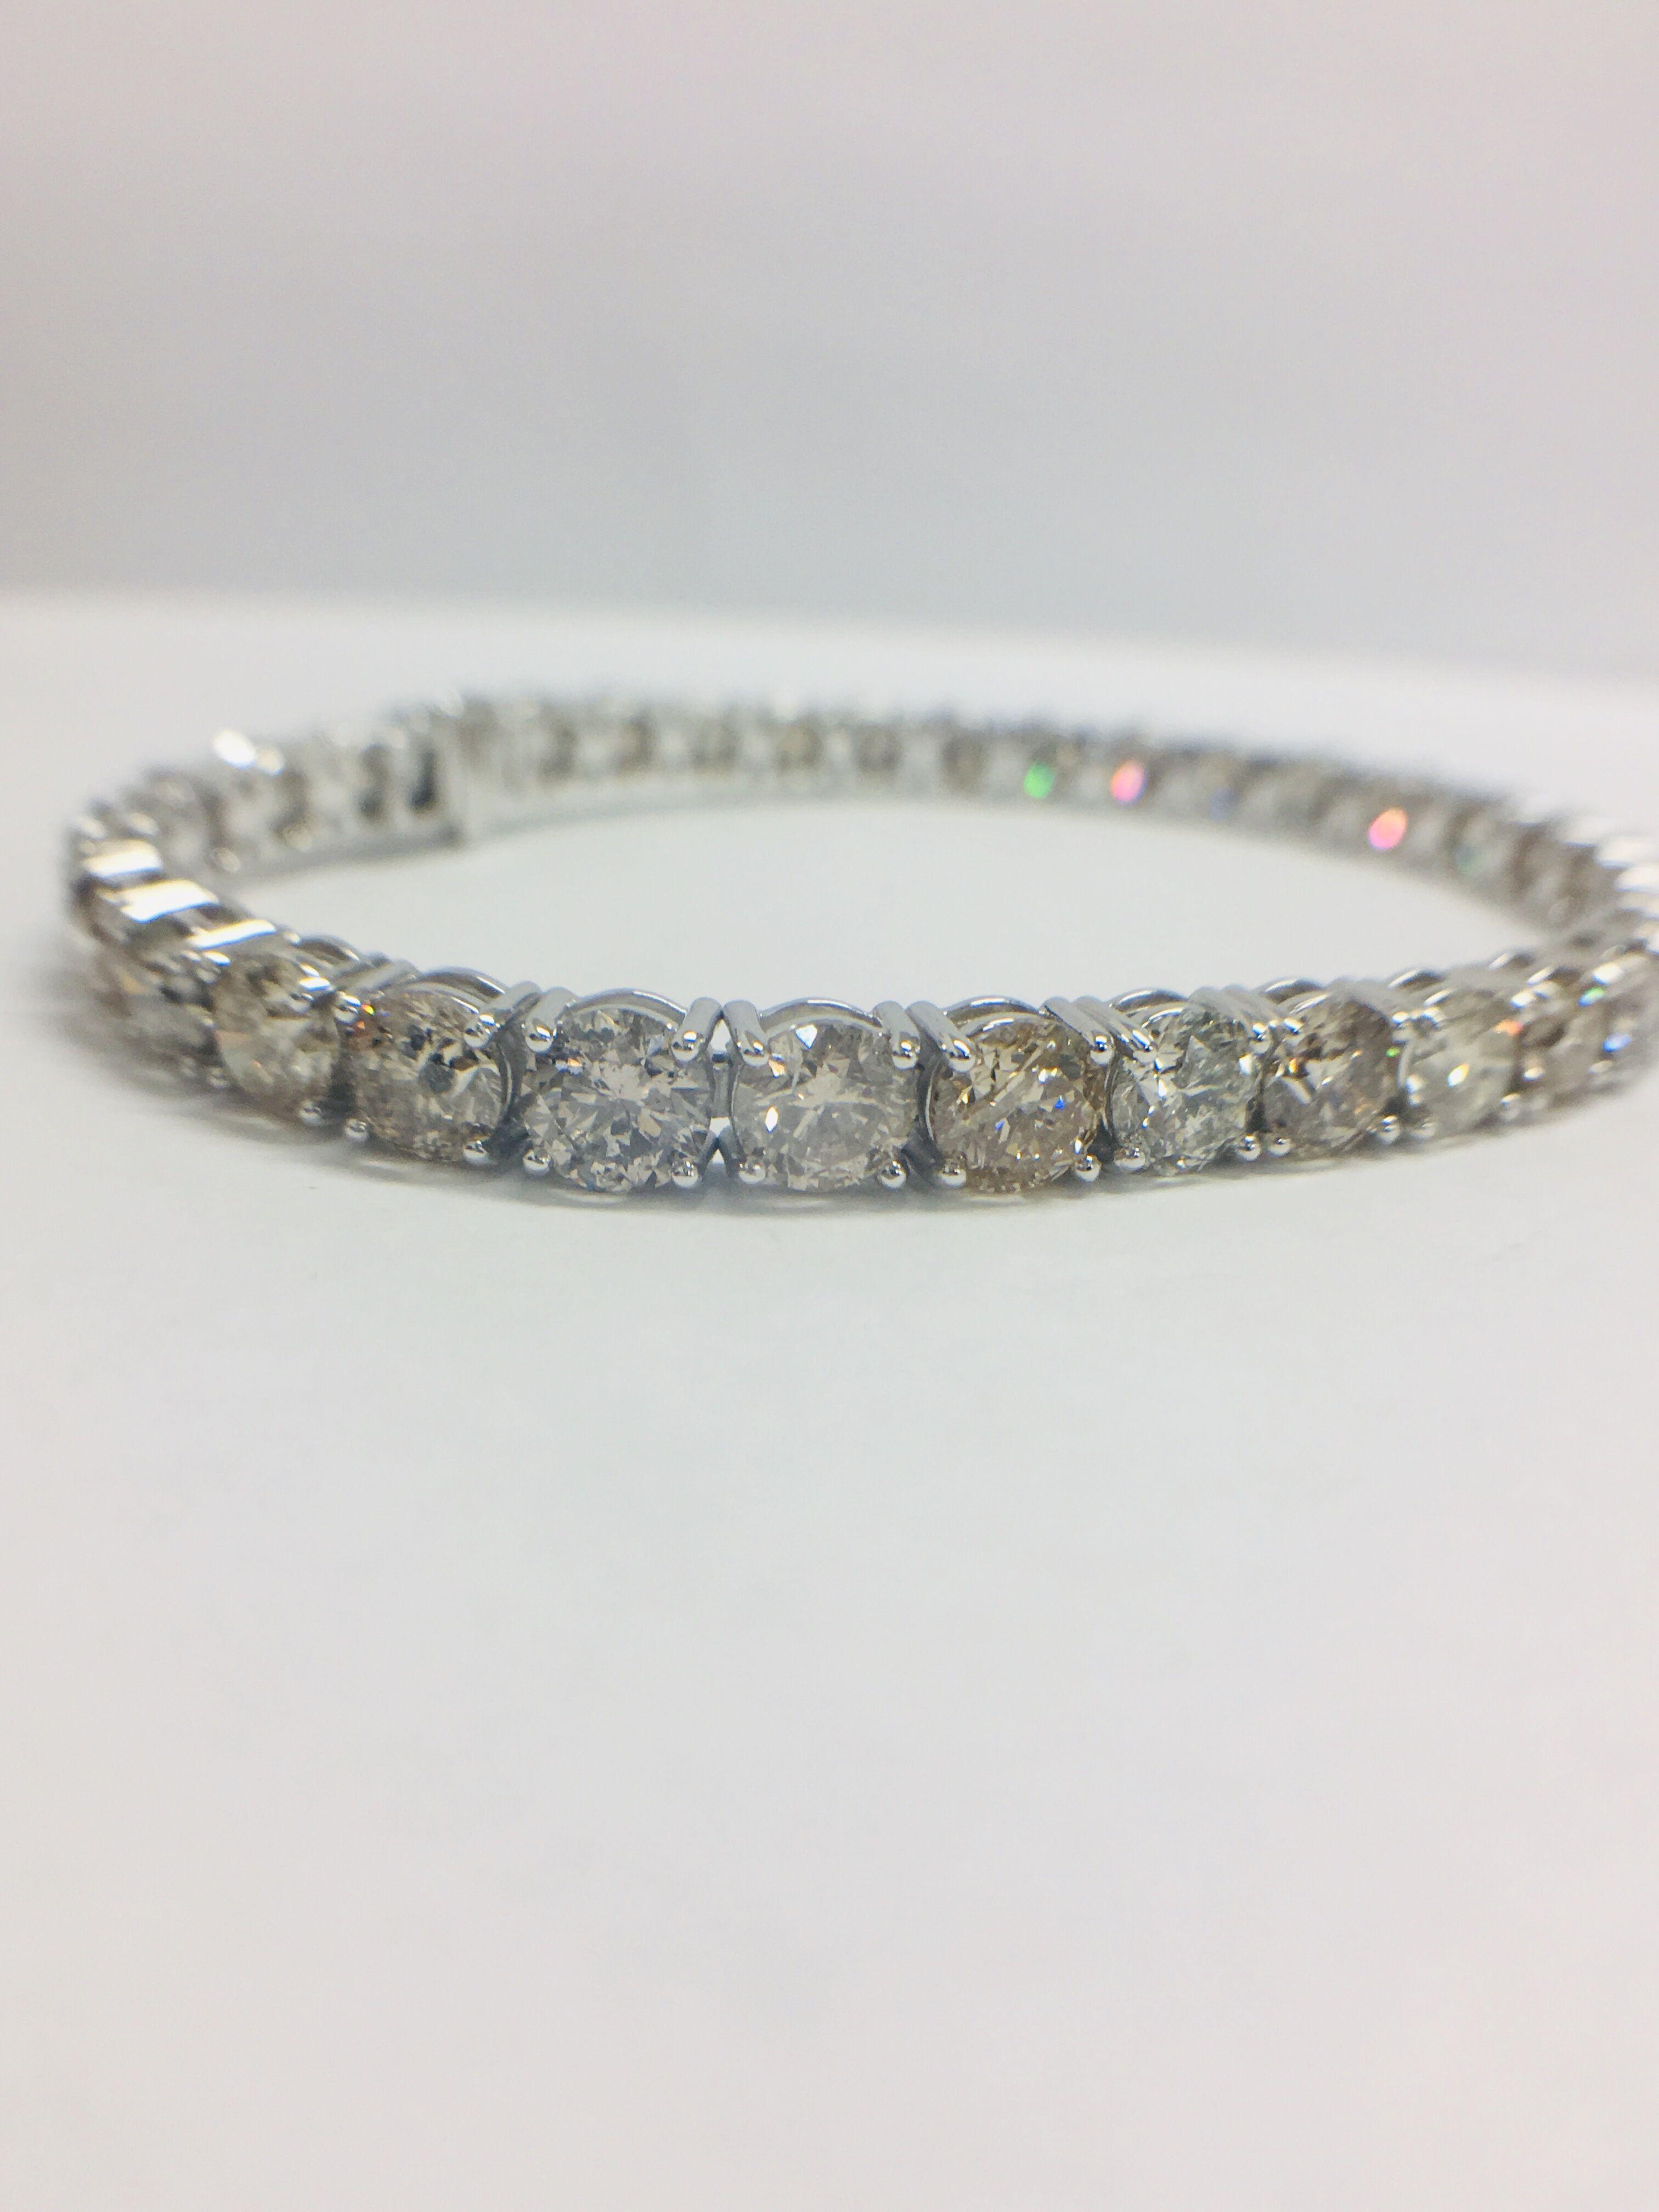 Vente Gemstone and platinum jewellery chez Diamondauctionsonline Ltd - Auction house : 43 lots